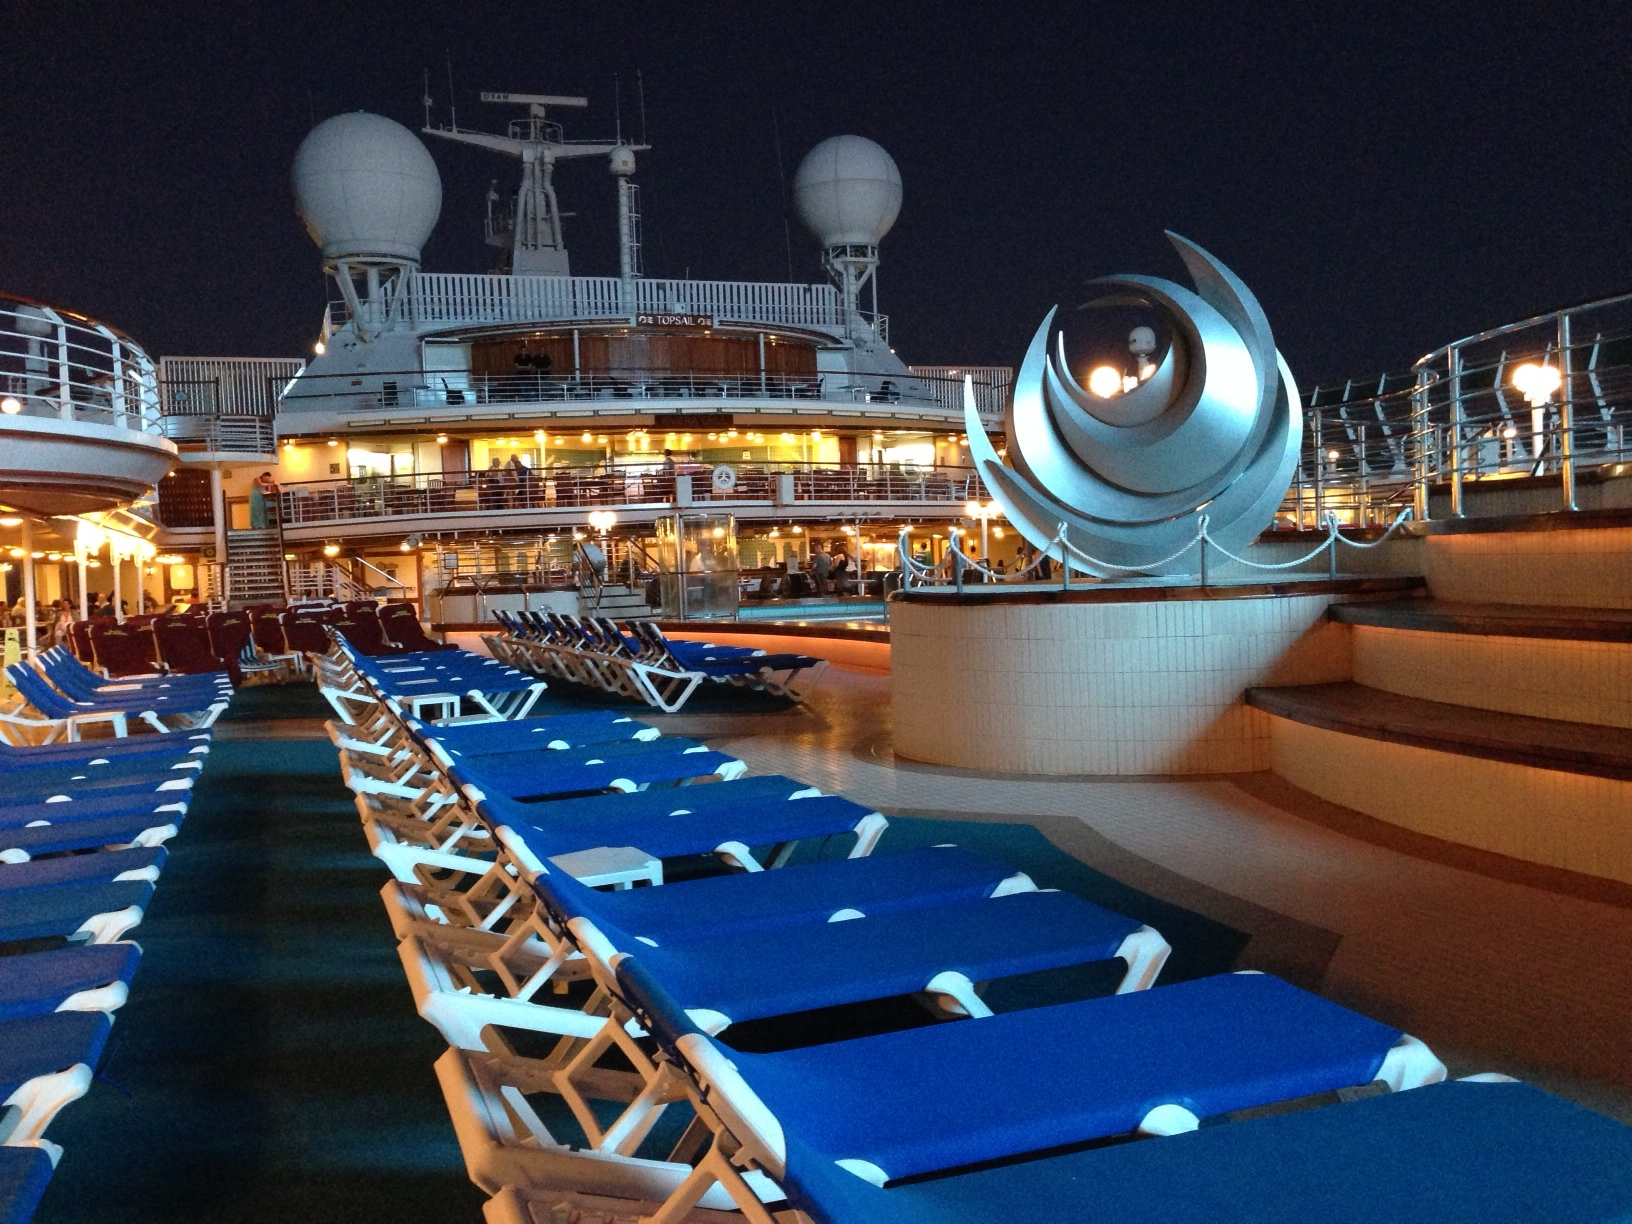 sea princess riviera deck chairs